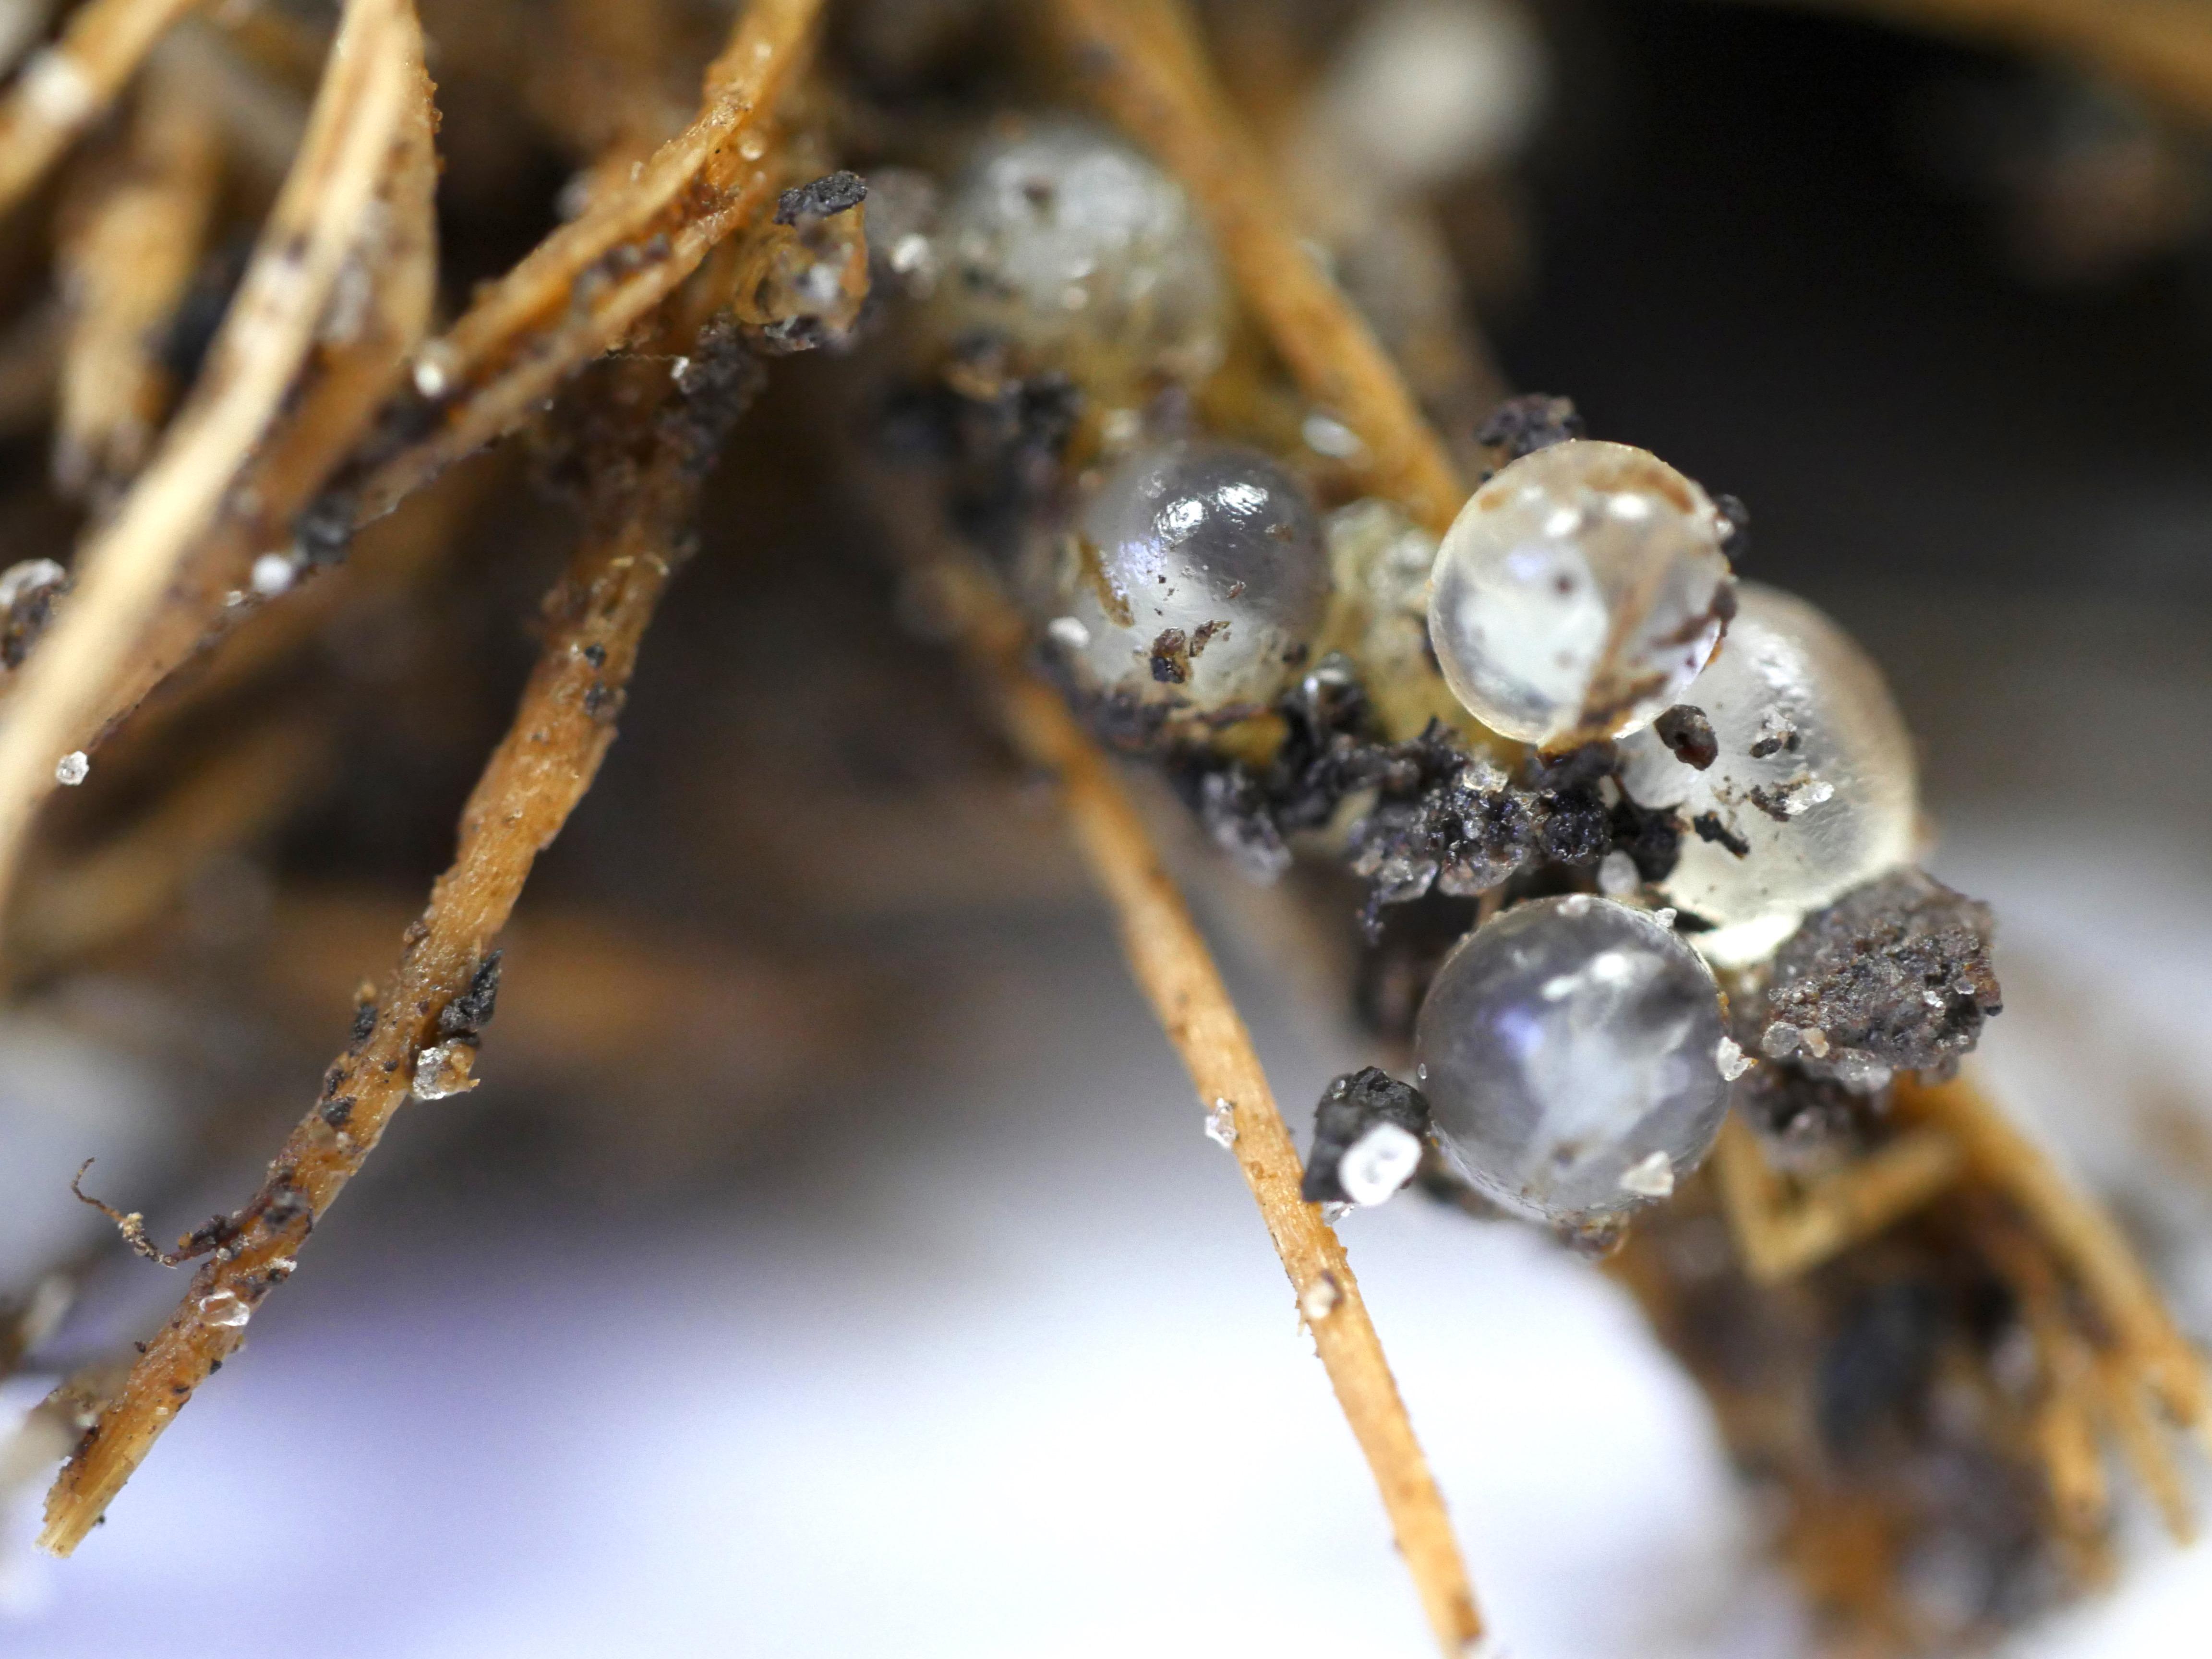 Close-up image of slug eggs